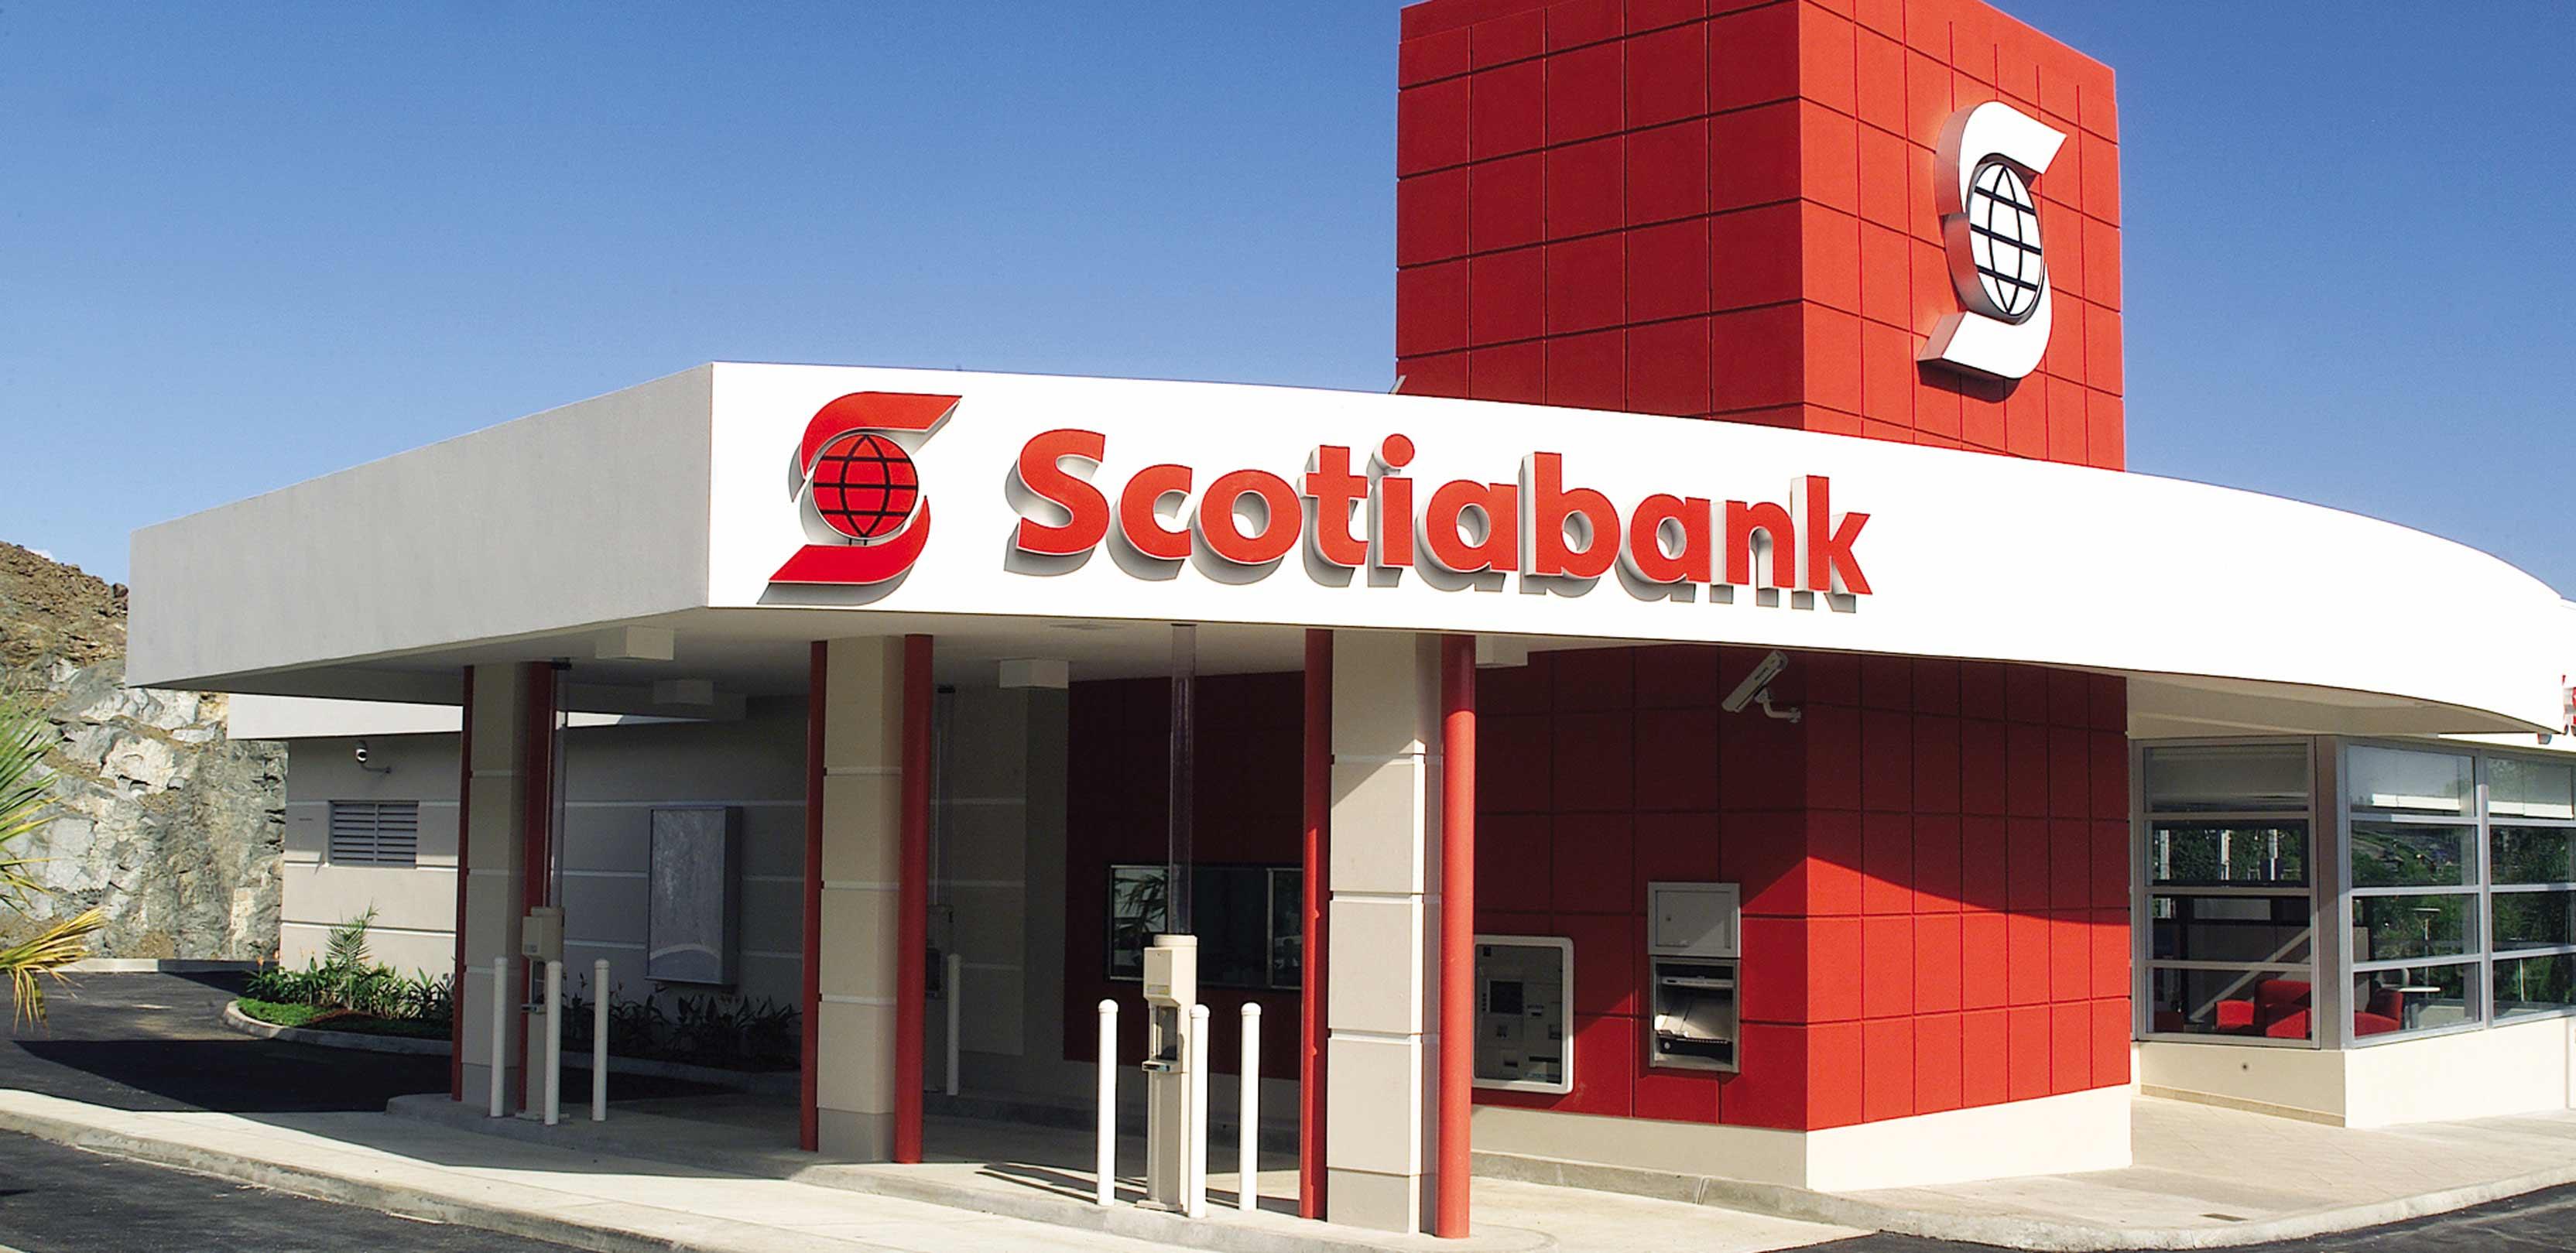 Scotiabank Storefront